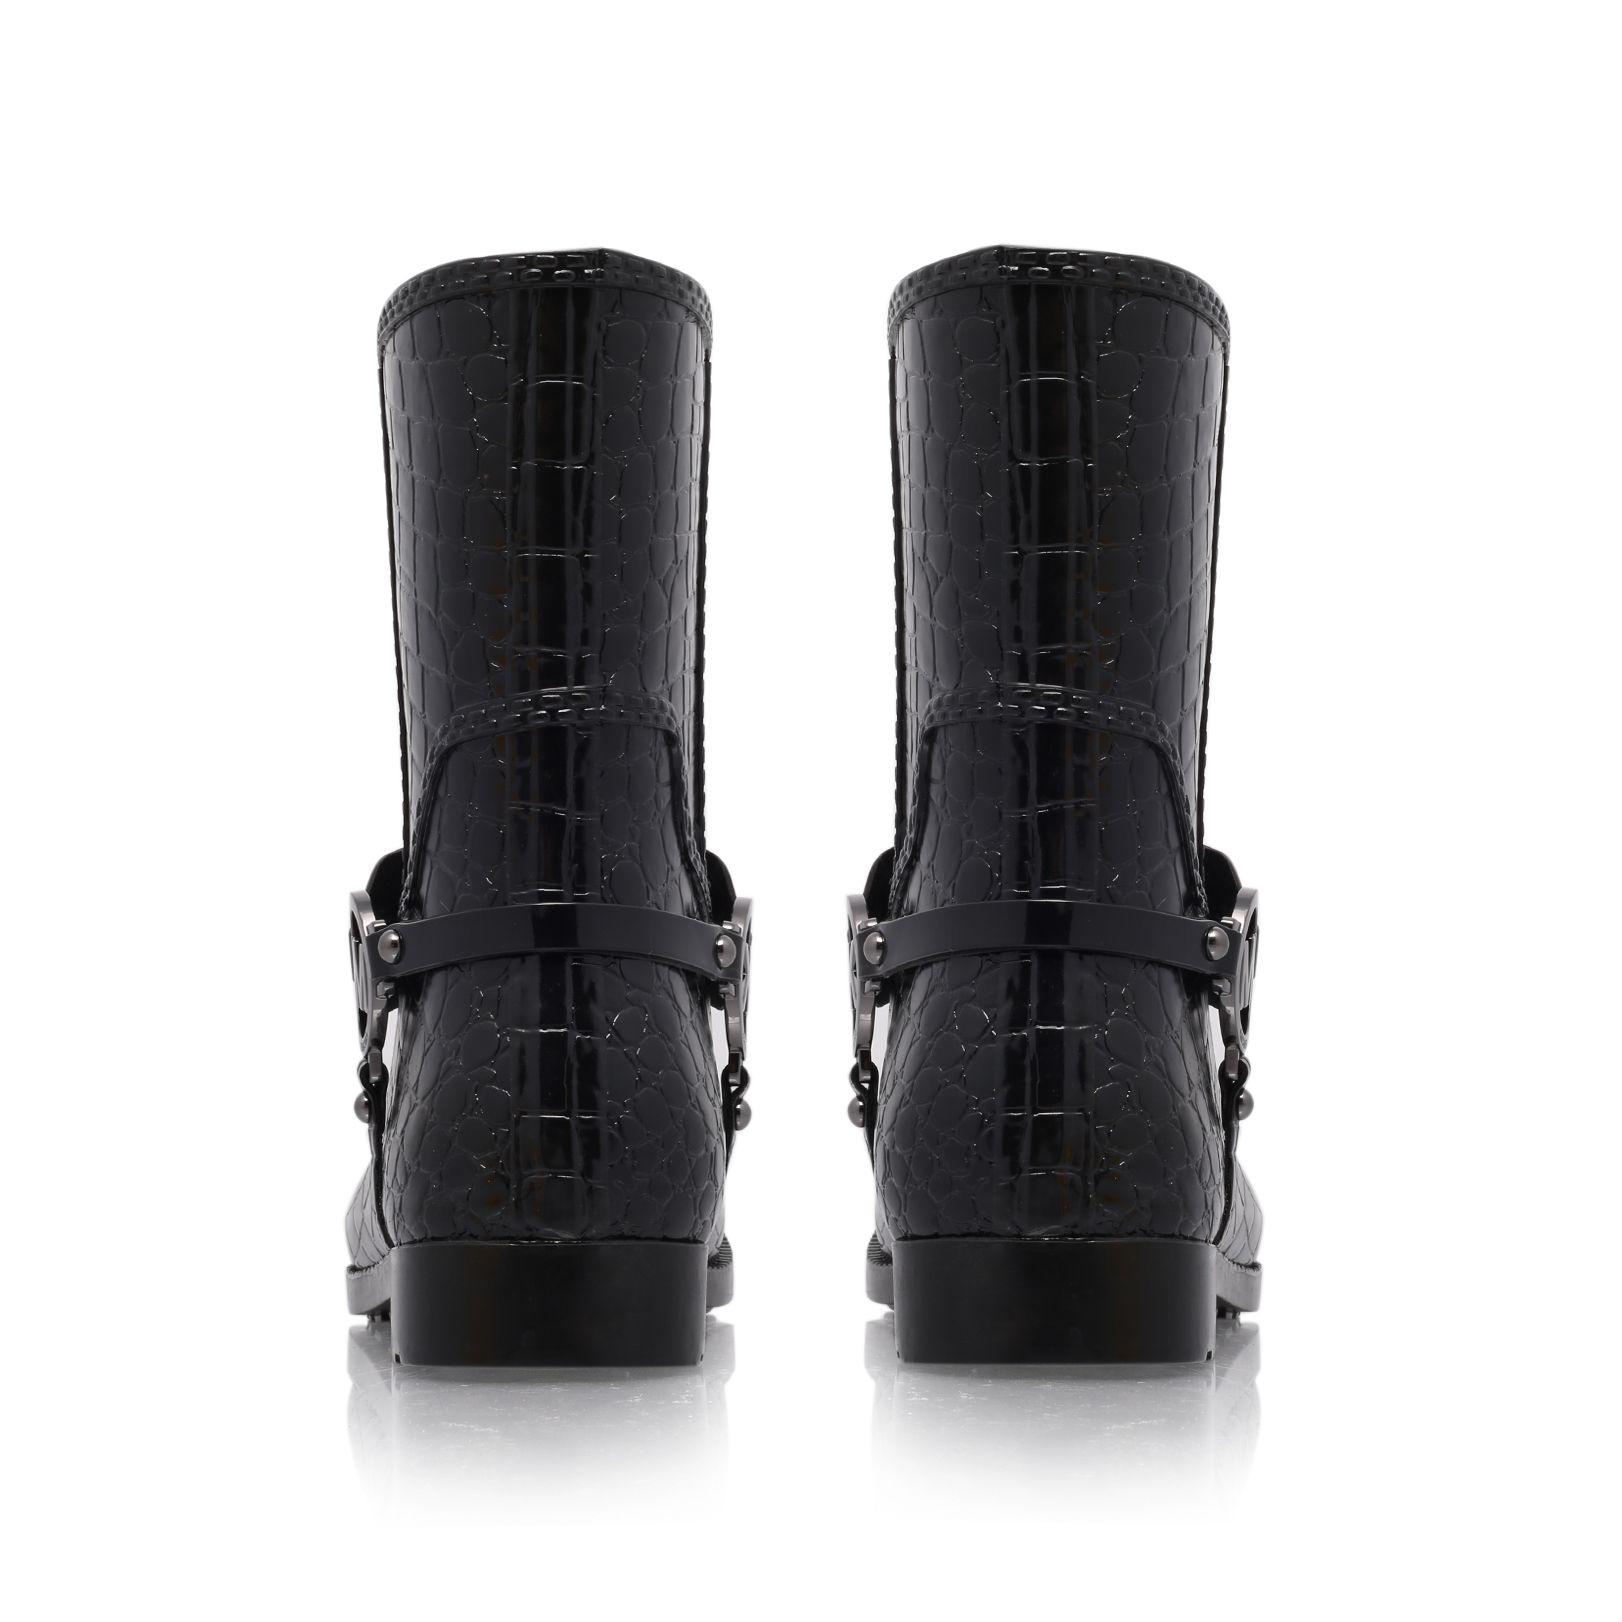 Michael Kors Synthetic Croco Rain Boot in Black